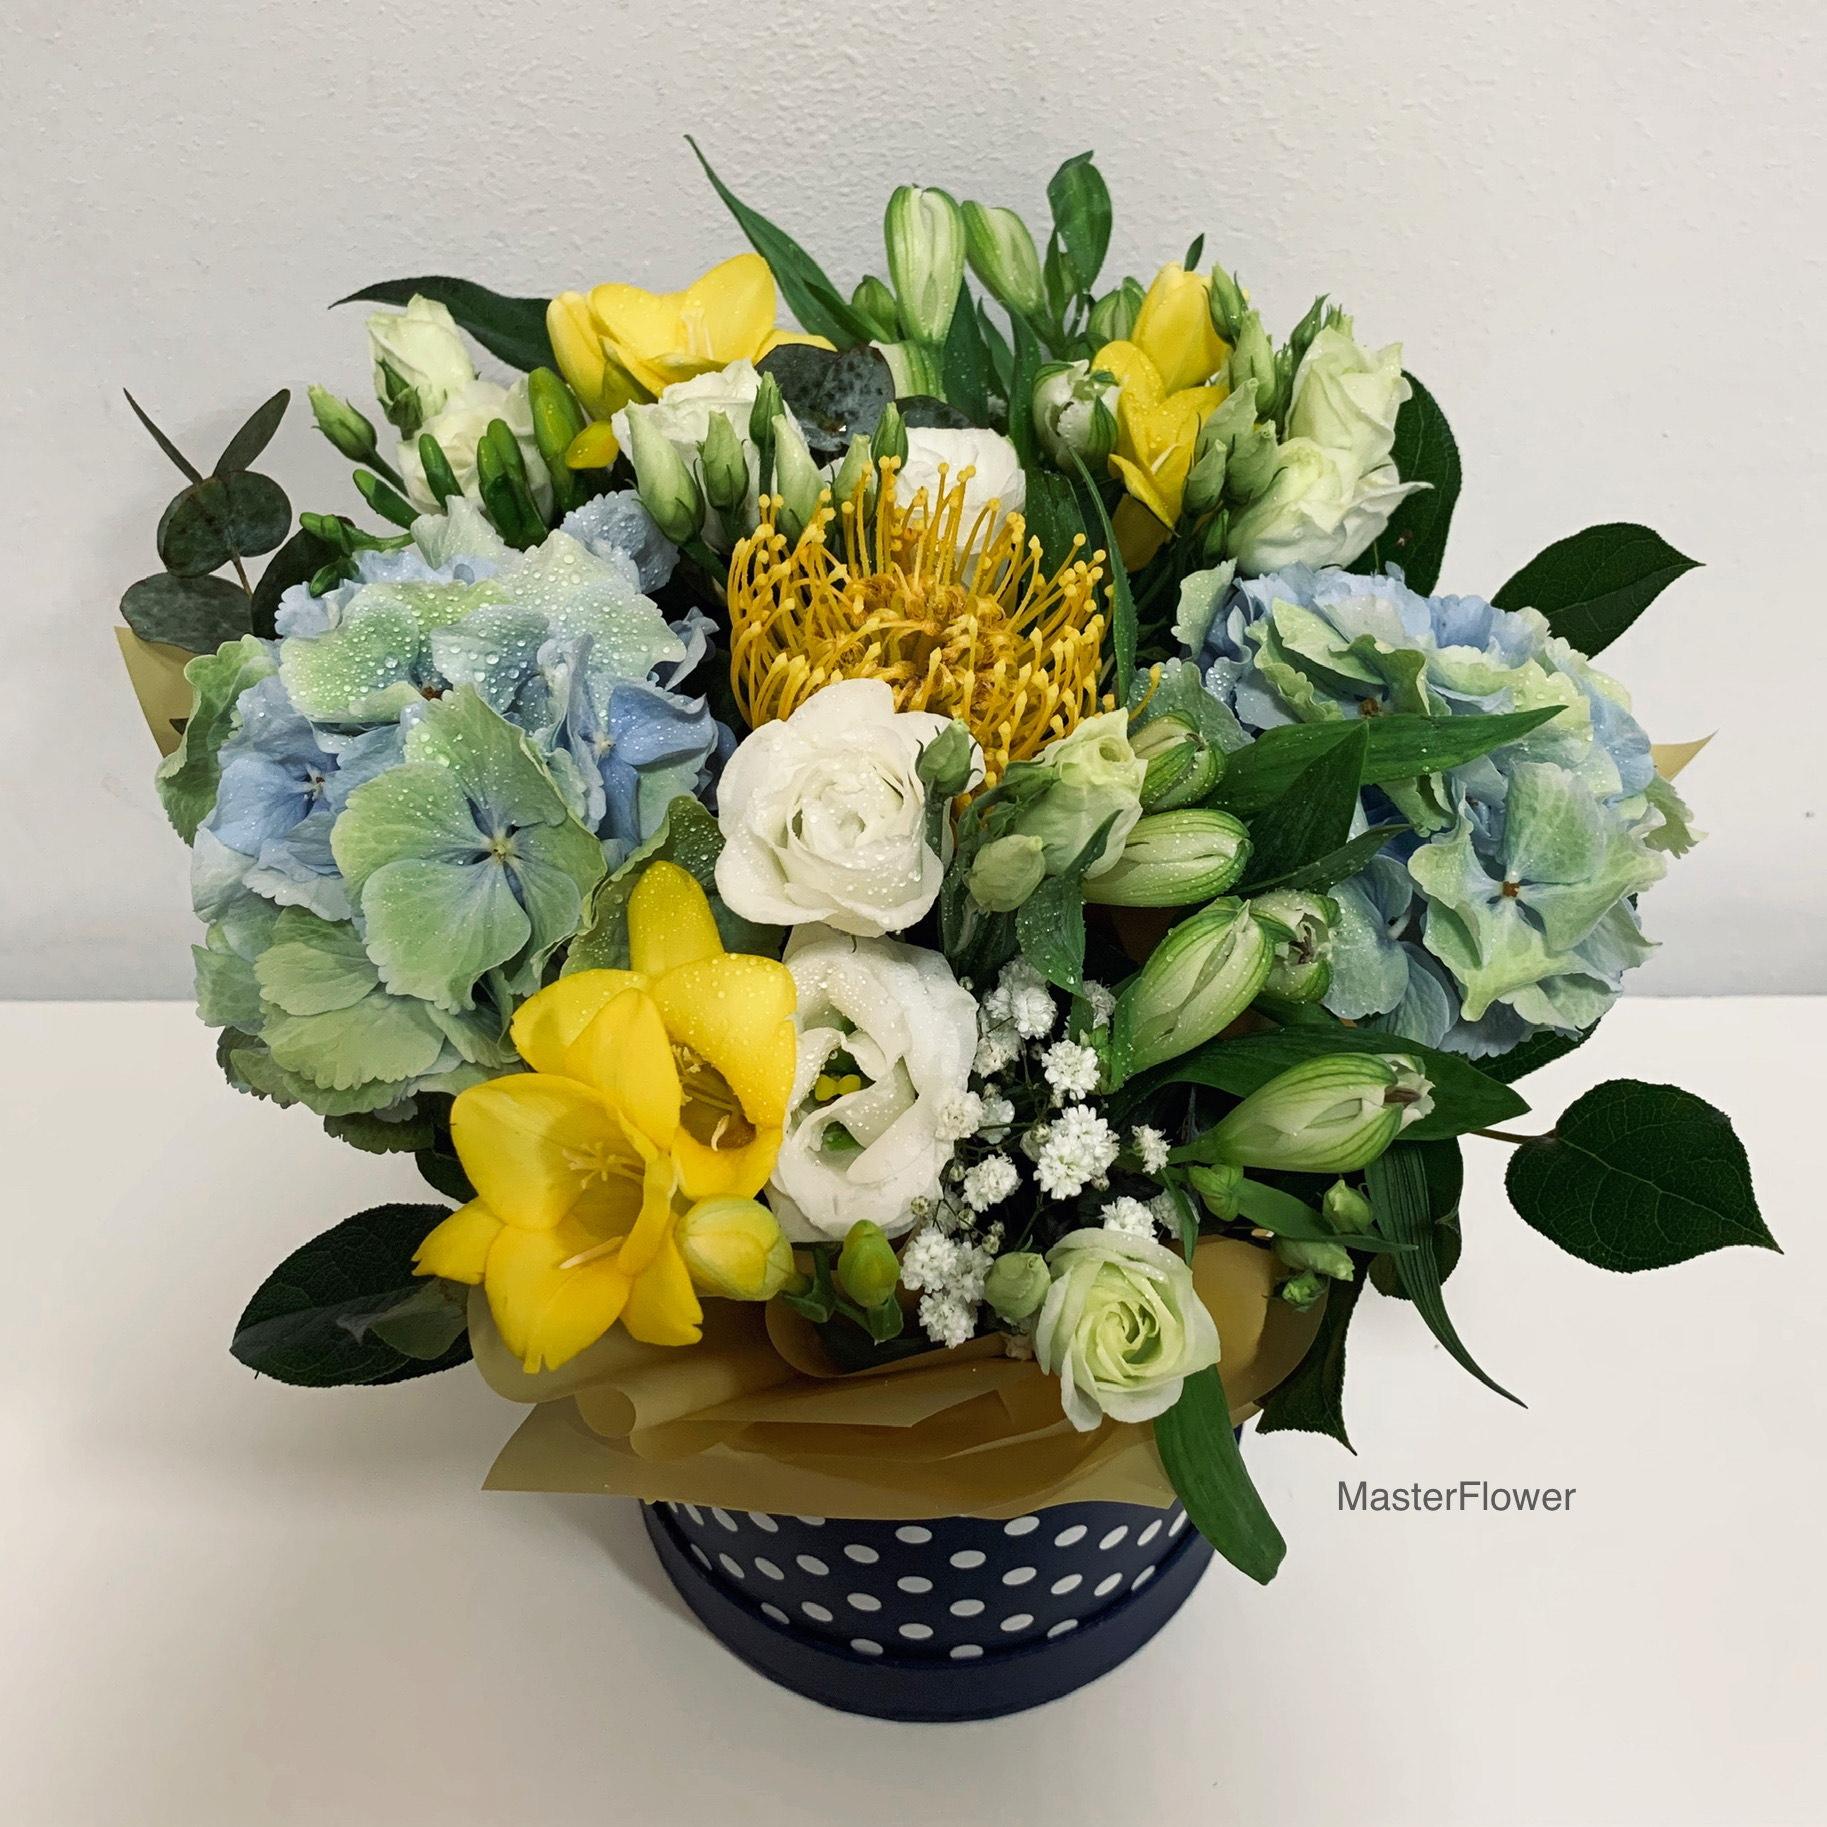 Aranjament floral cu hortensii